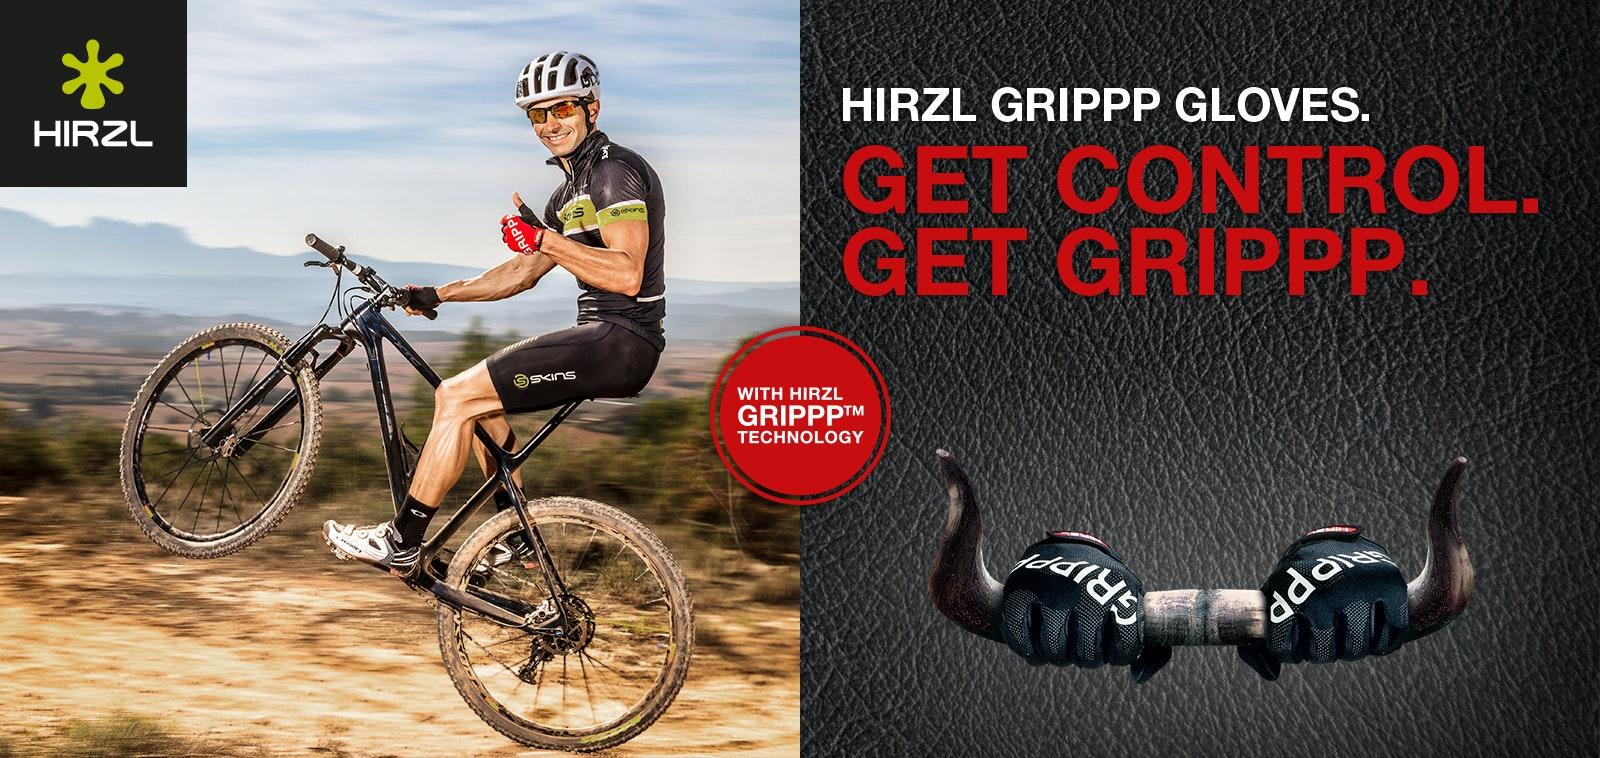 HIRZL GRIPPP Handschuhe | BikeExchange